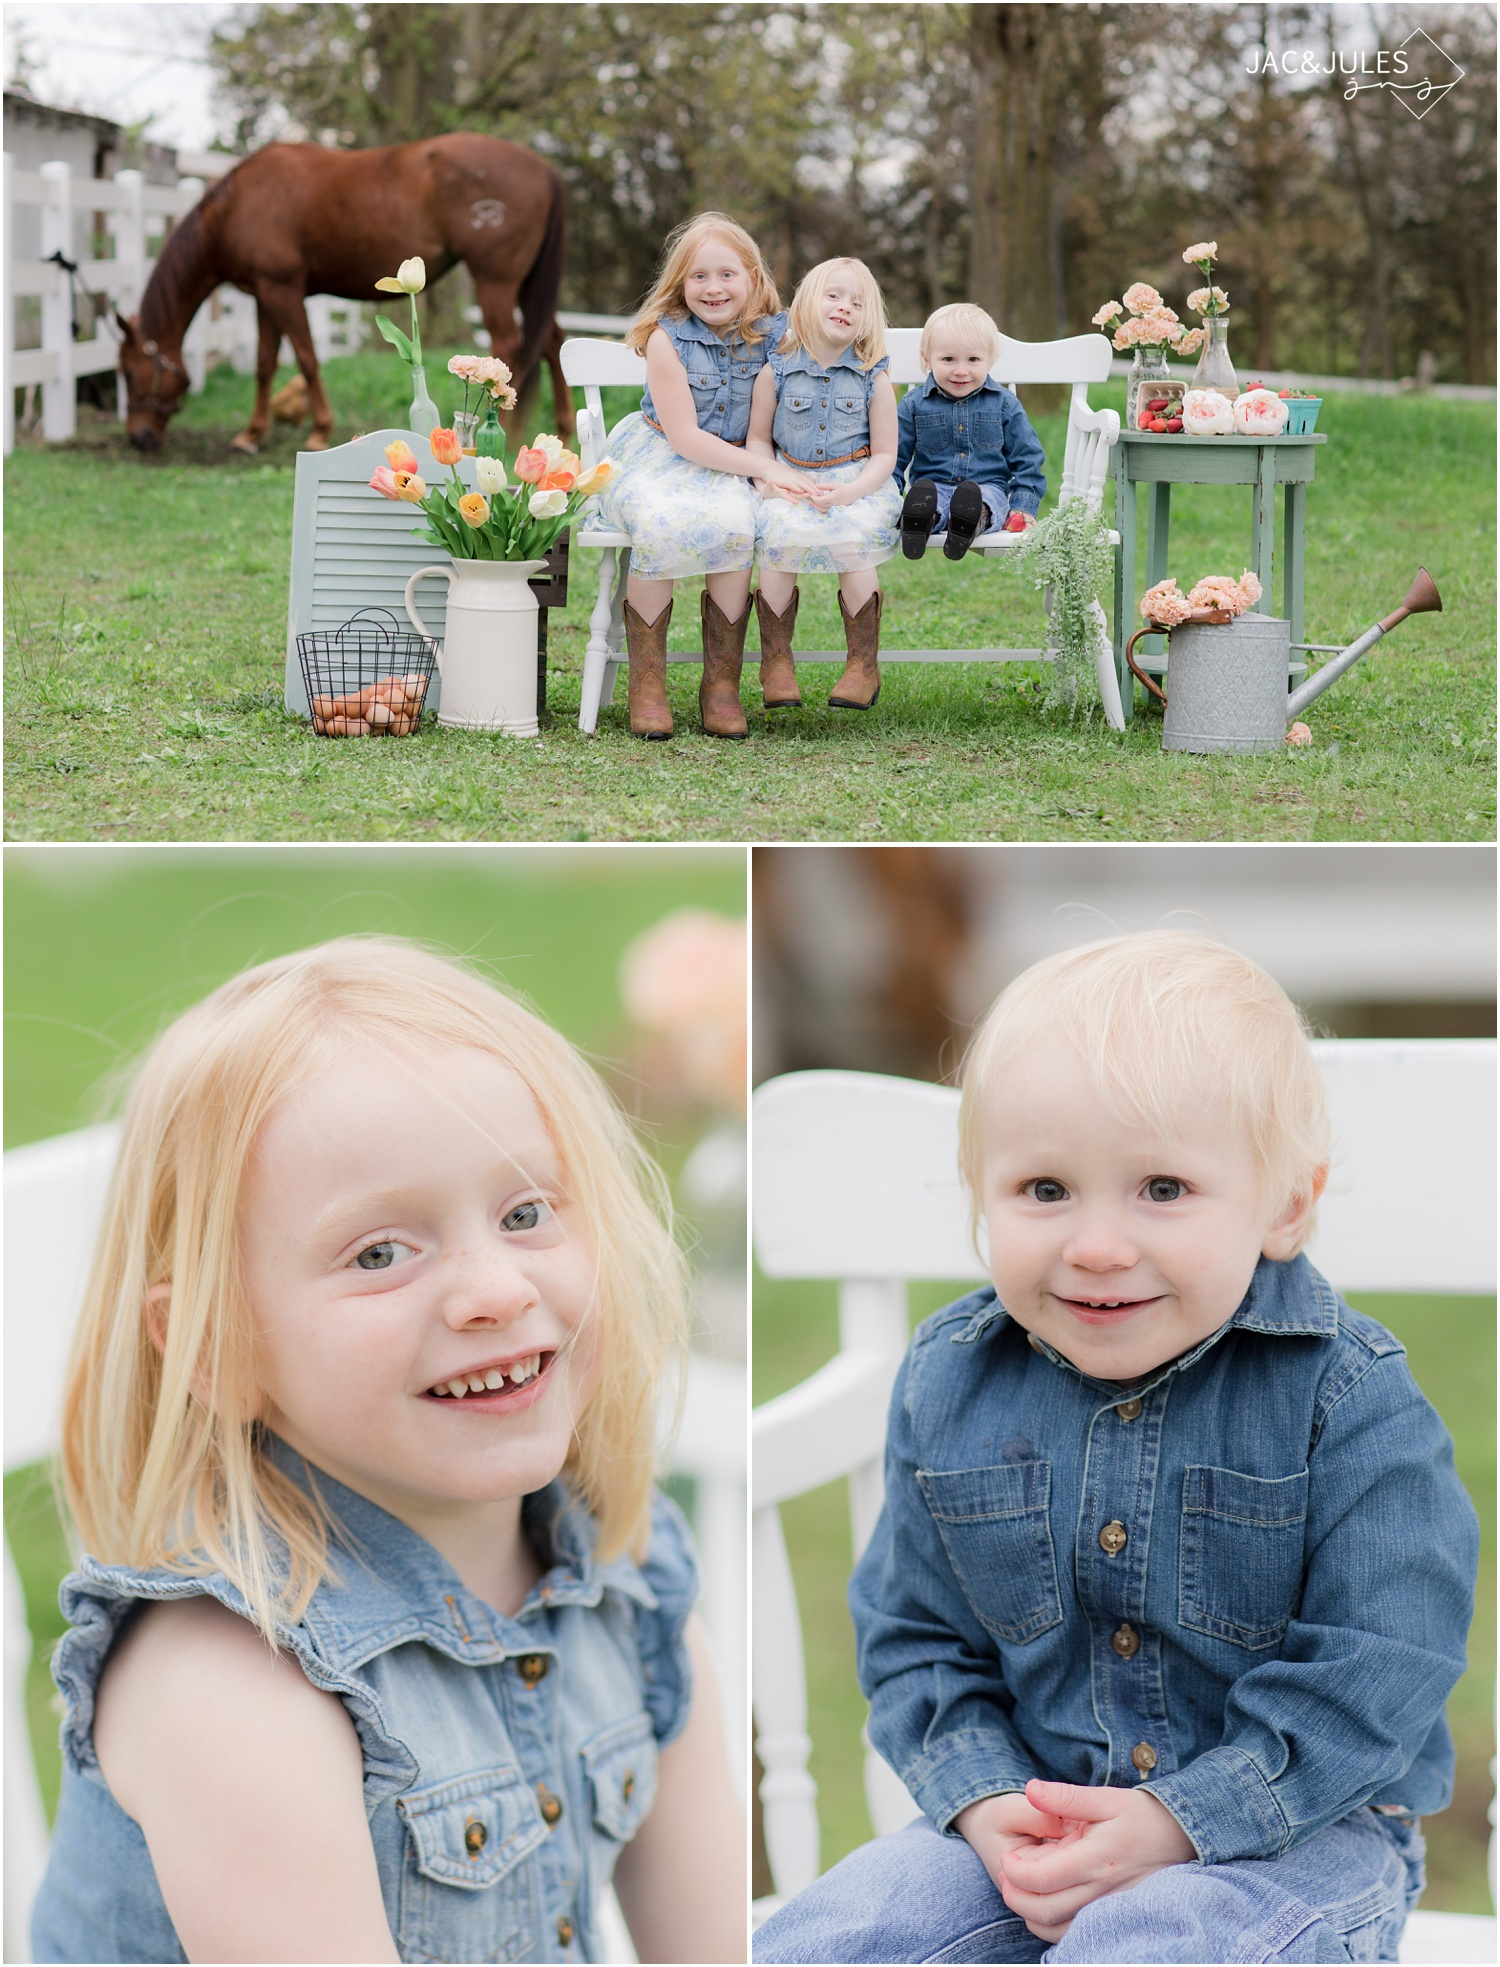 cute kid photos at styled photo session at a horse farm in cream ridge, nj.